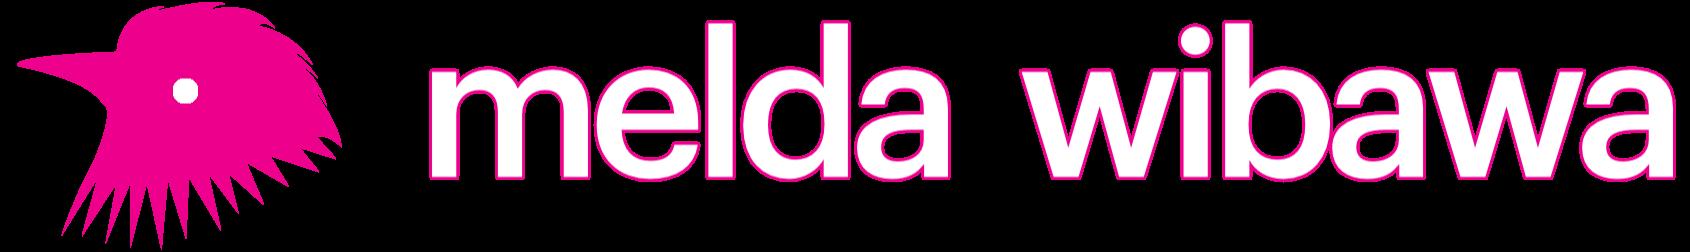 Melda Wibawa